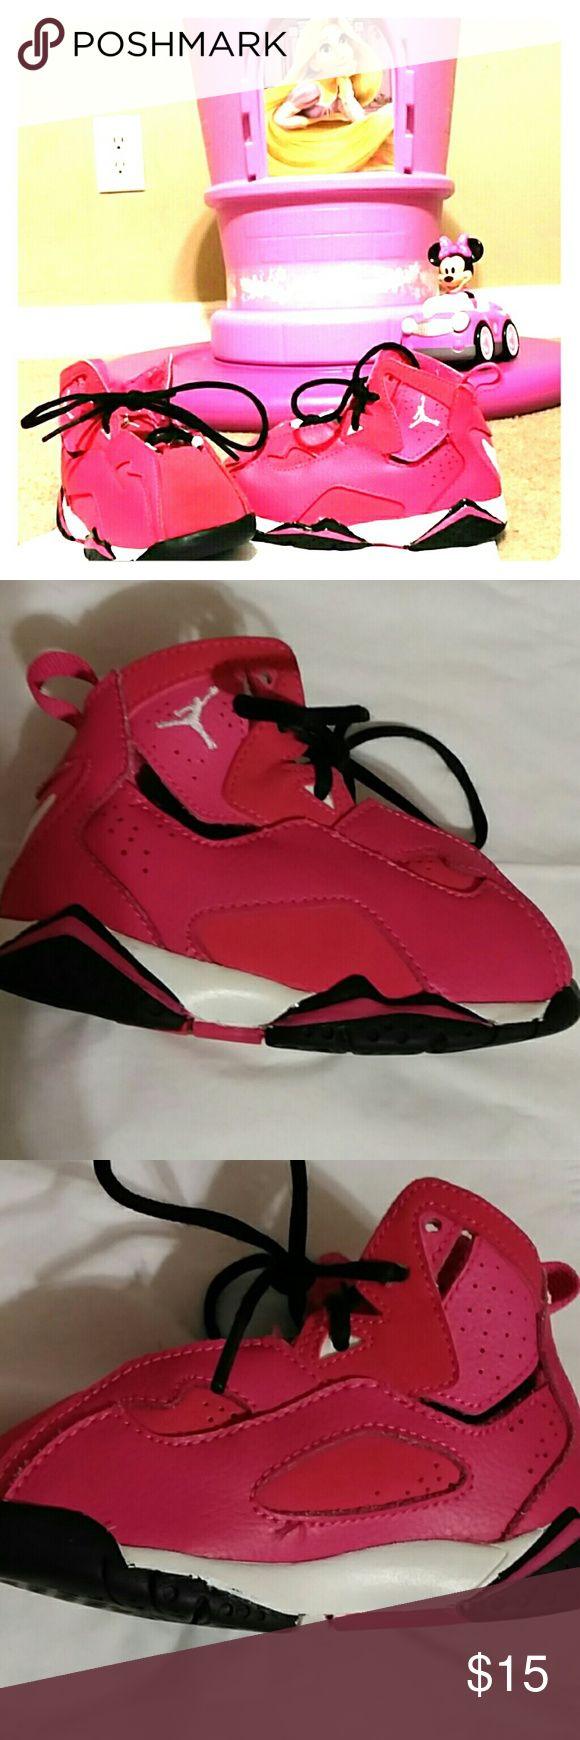 Jordan True Flights For Toddler Only Worn A Few Times Jordan Shoes Sneakers